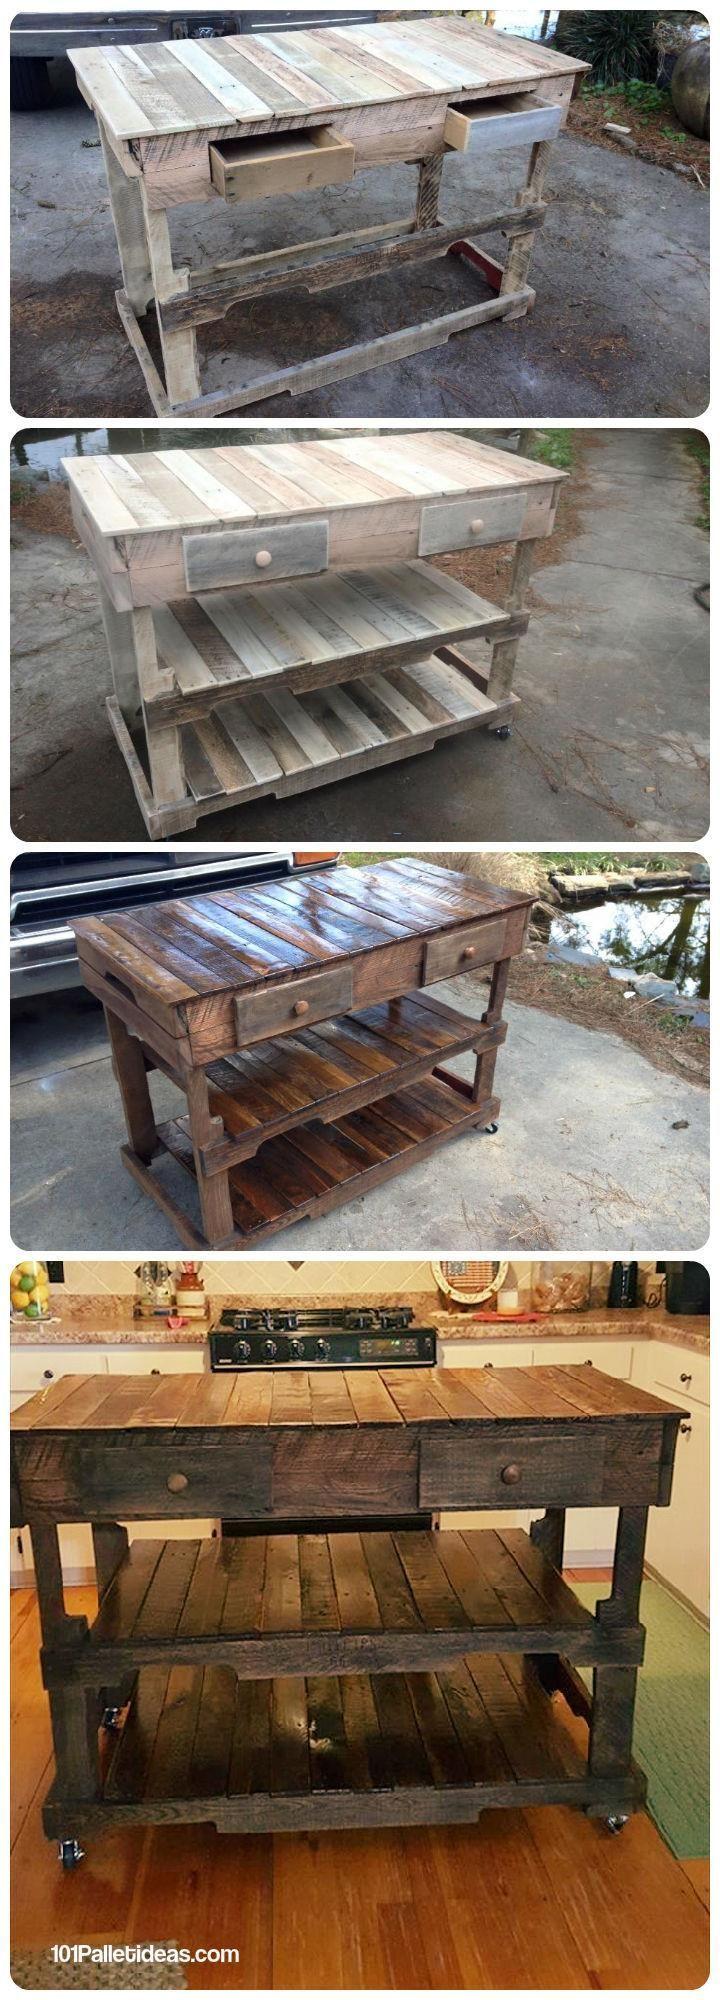 Pallets Wood Made Kitchen Island - 101 Pallet Ideas & Pallet Projects... - http://centophobe.com/pallets-wood-made-kitchen-island-101-pallet-ideas-pallet-projects-2/ -